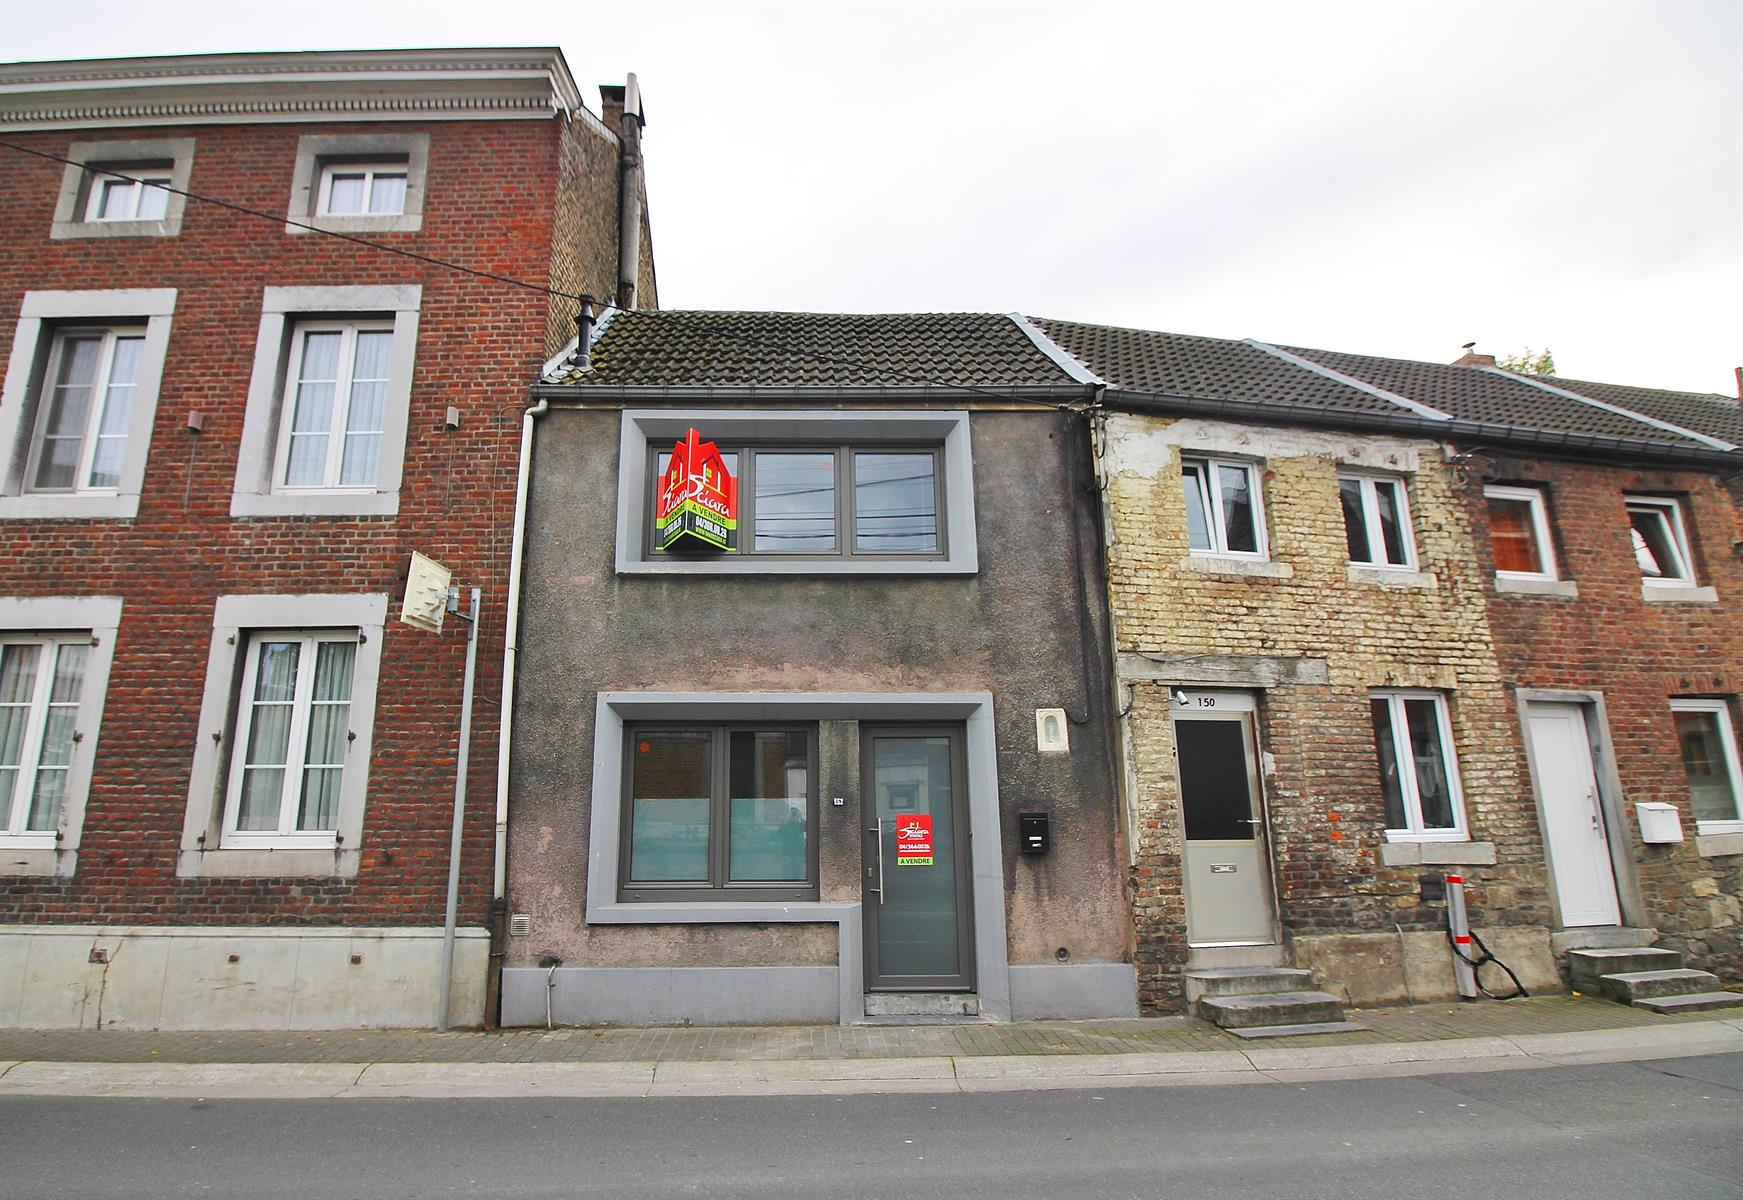 Maison - Liège Jupillesur-Meuse - #4185763-0